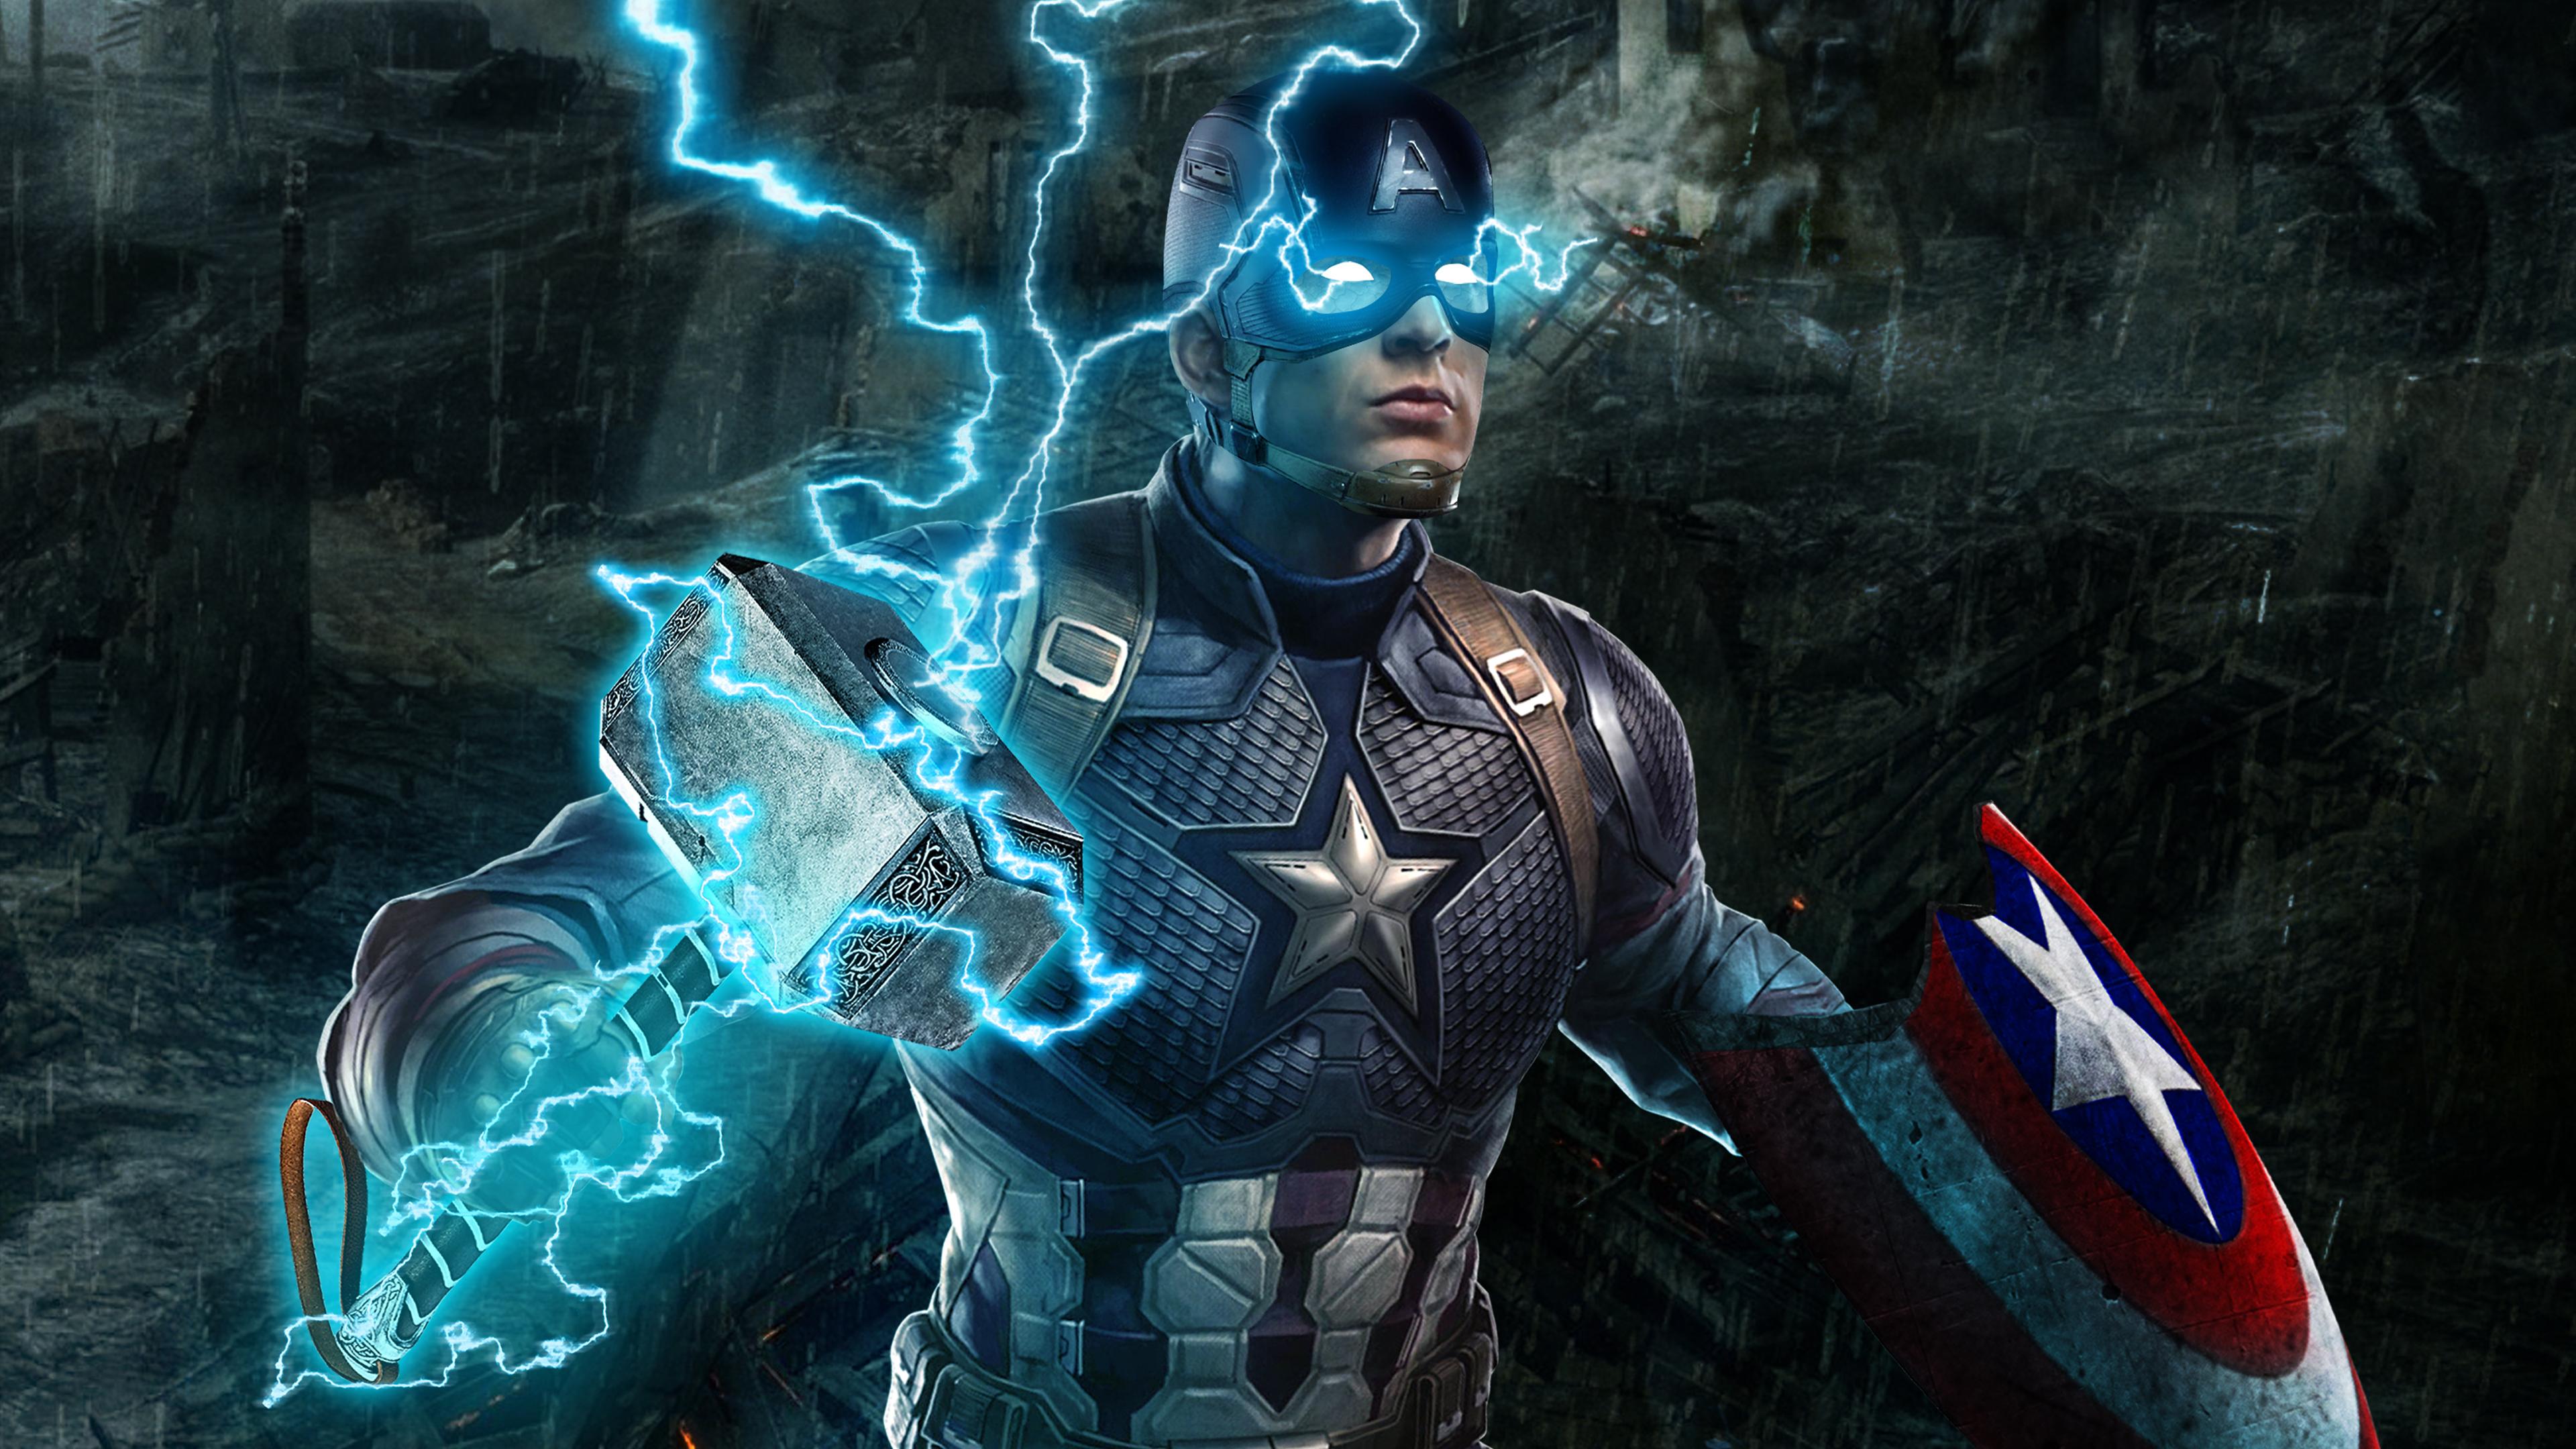 Captain America Avengers Endgame 4k, HD Superheroes, 4k ...